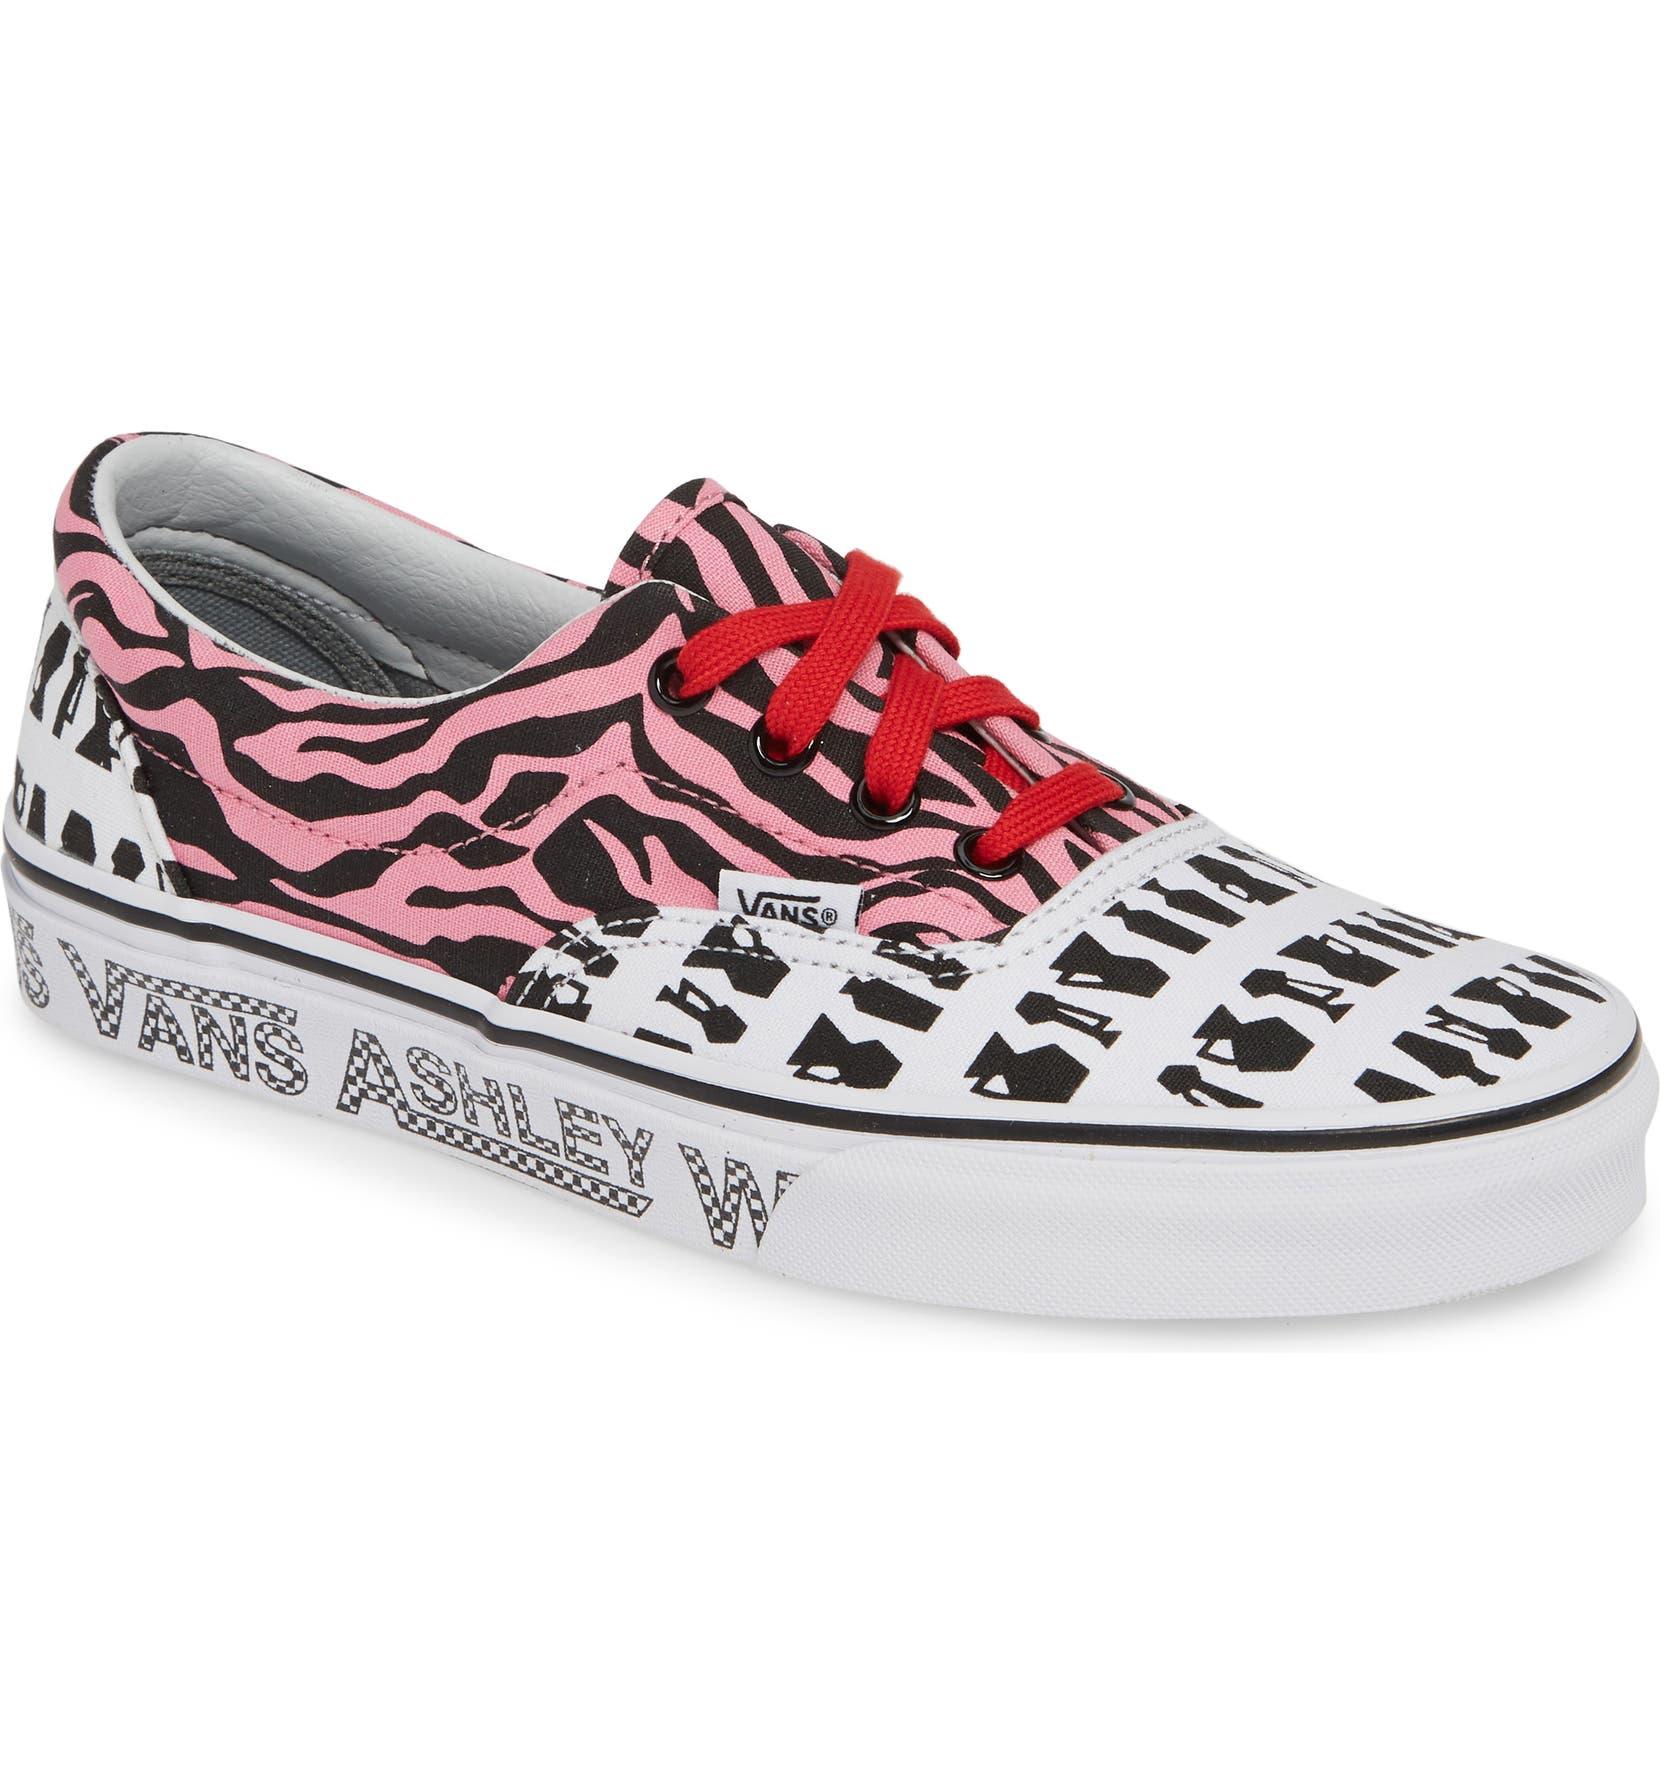 c20d768c46 Vans x Ashley Williams Era Mixed Print Sneaker (Unisex)